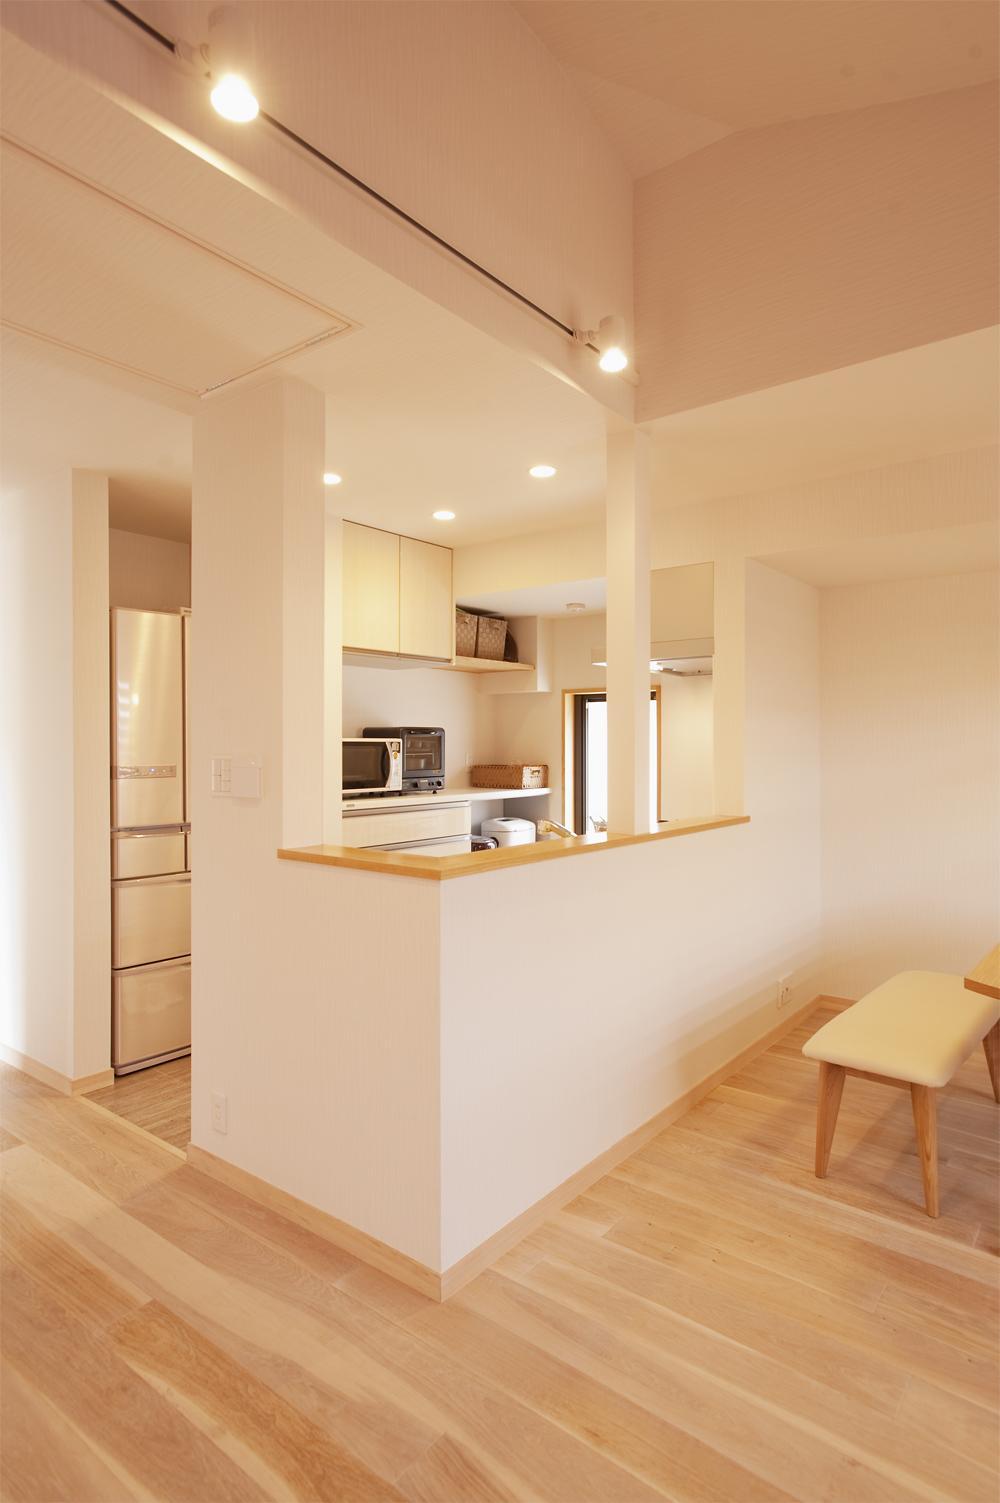 K邸・みんなでお家に帰ろう!の写真 オープンな対面式キッチン